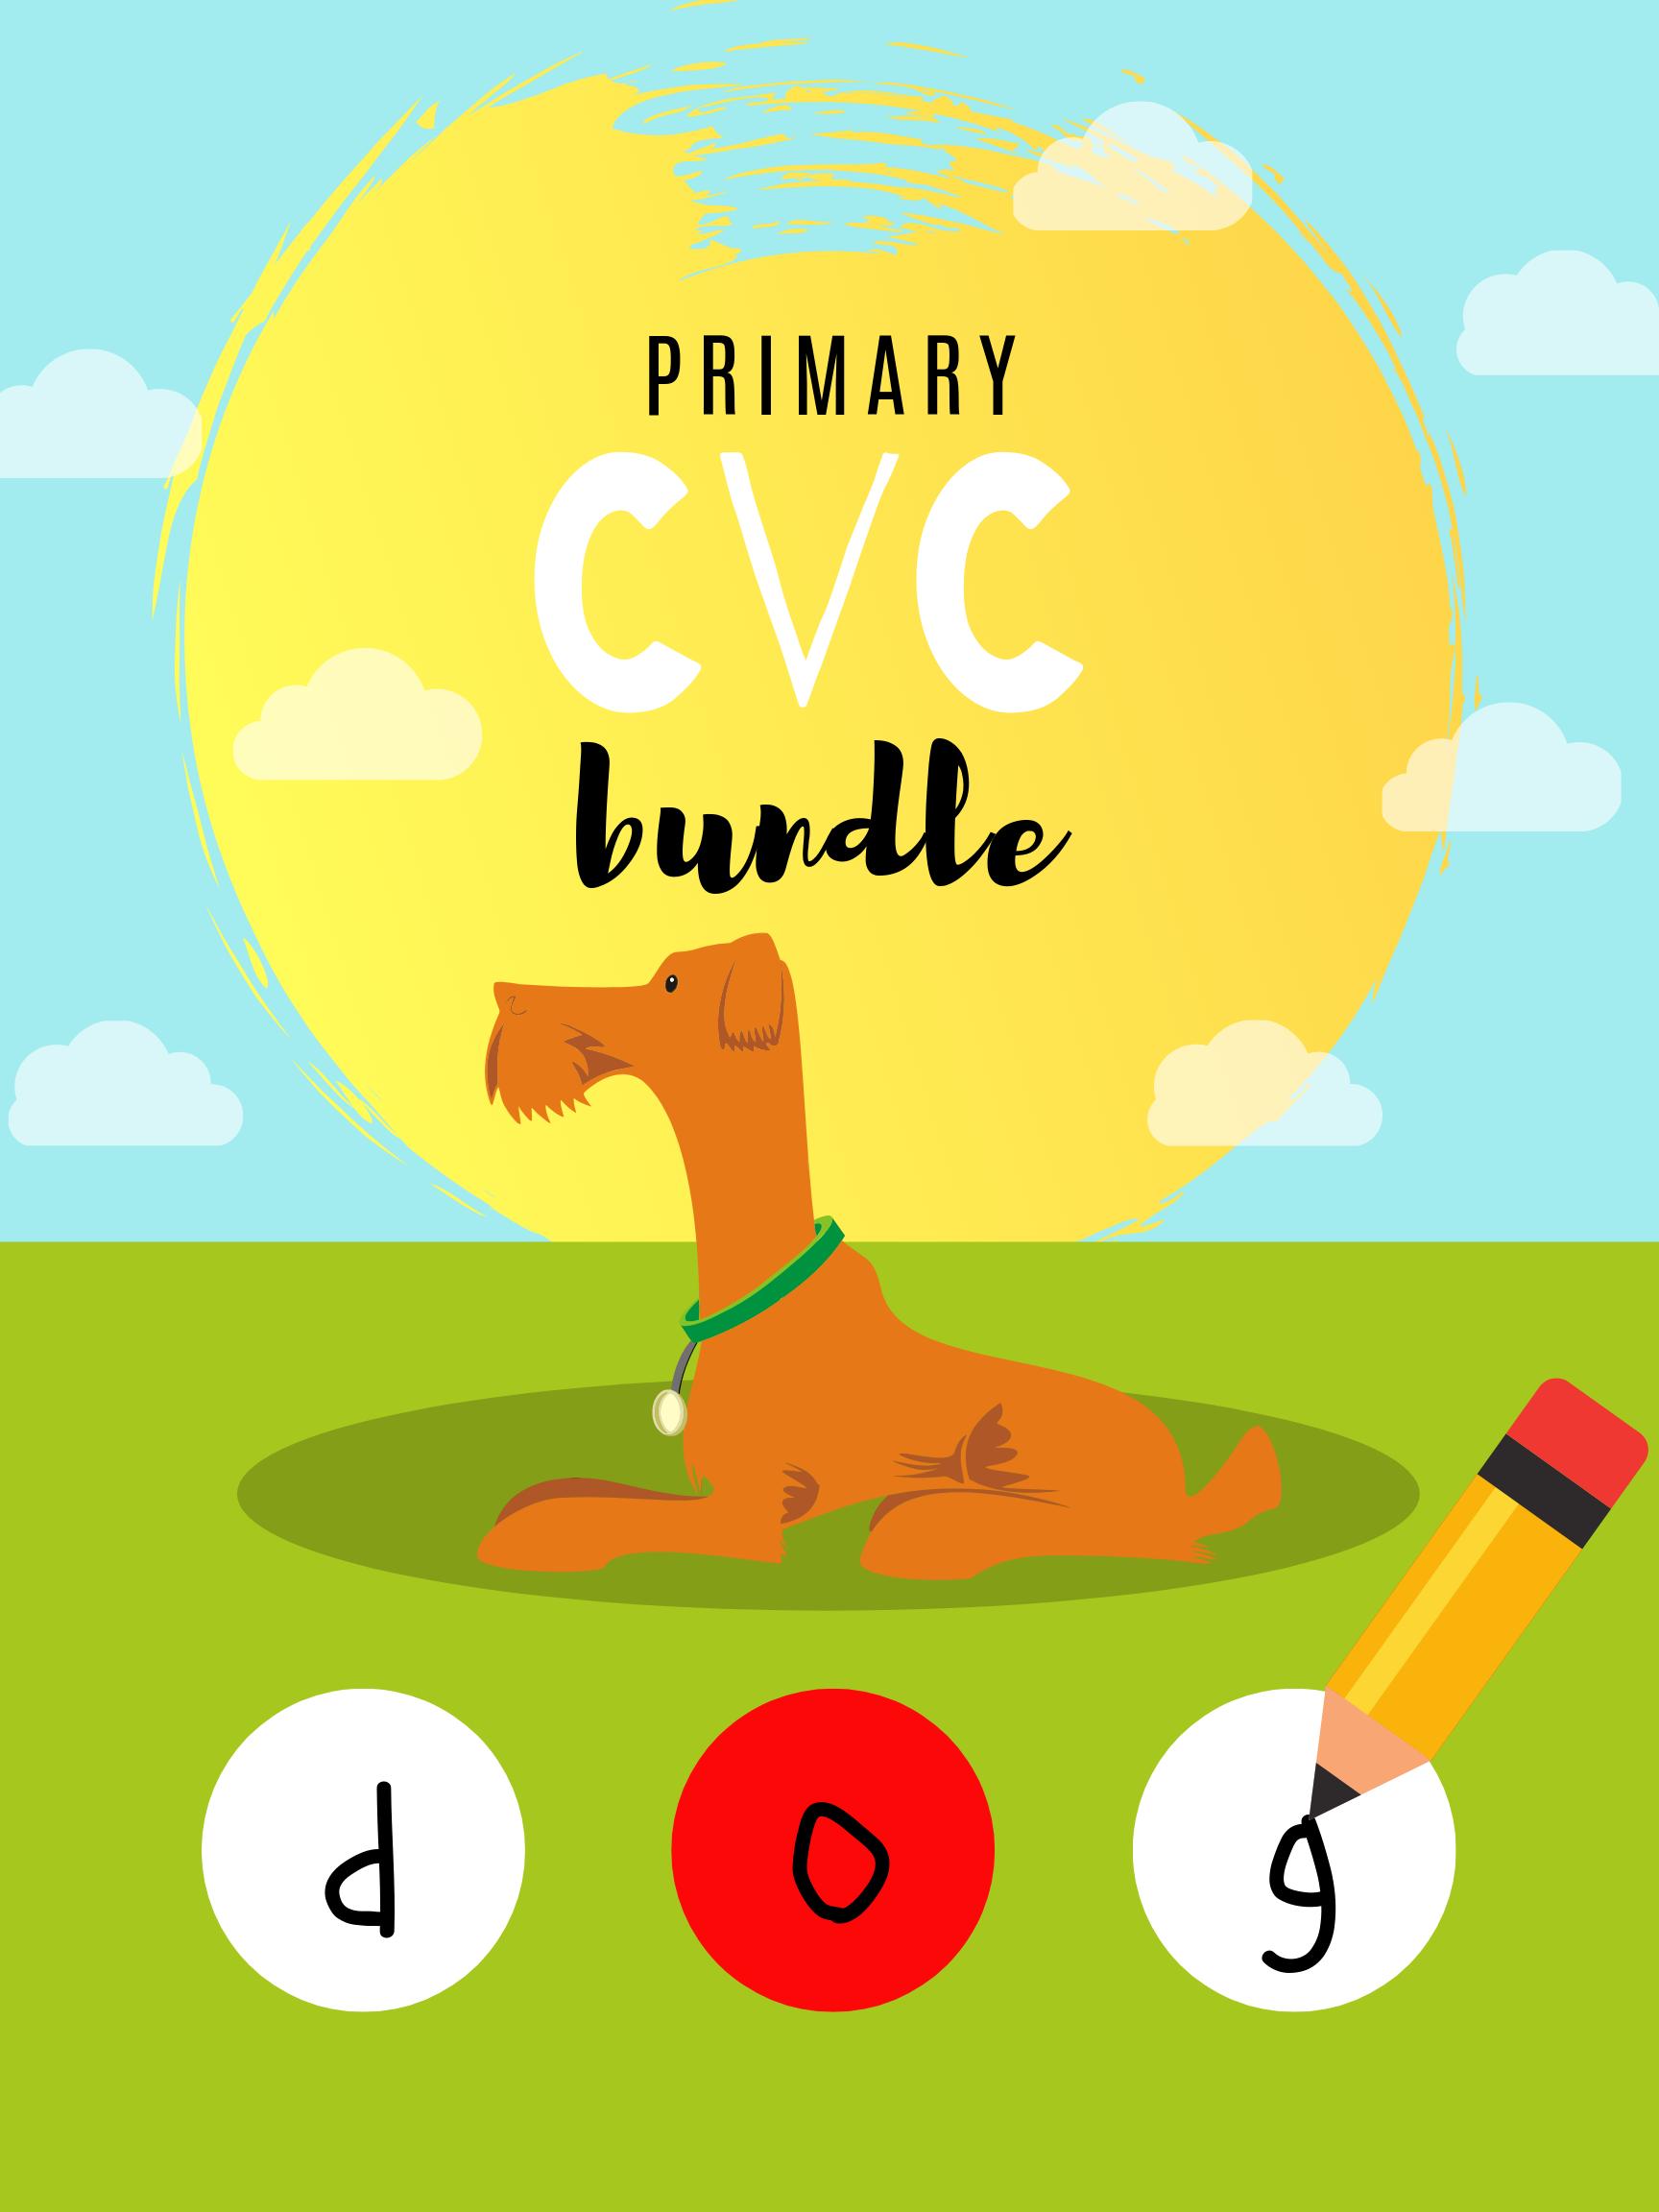 Primary Cvc Pack